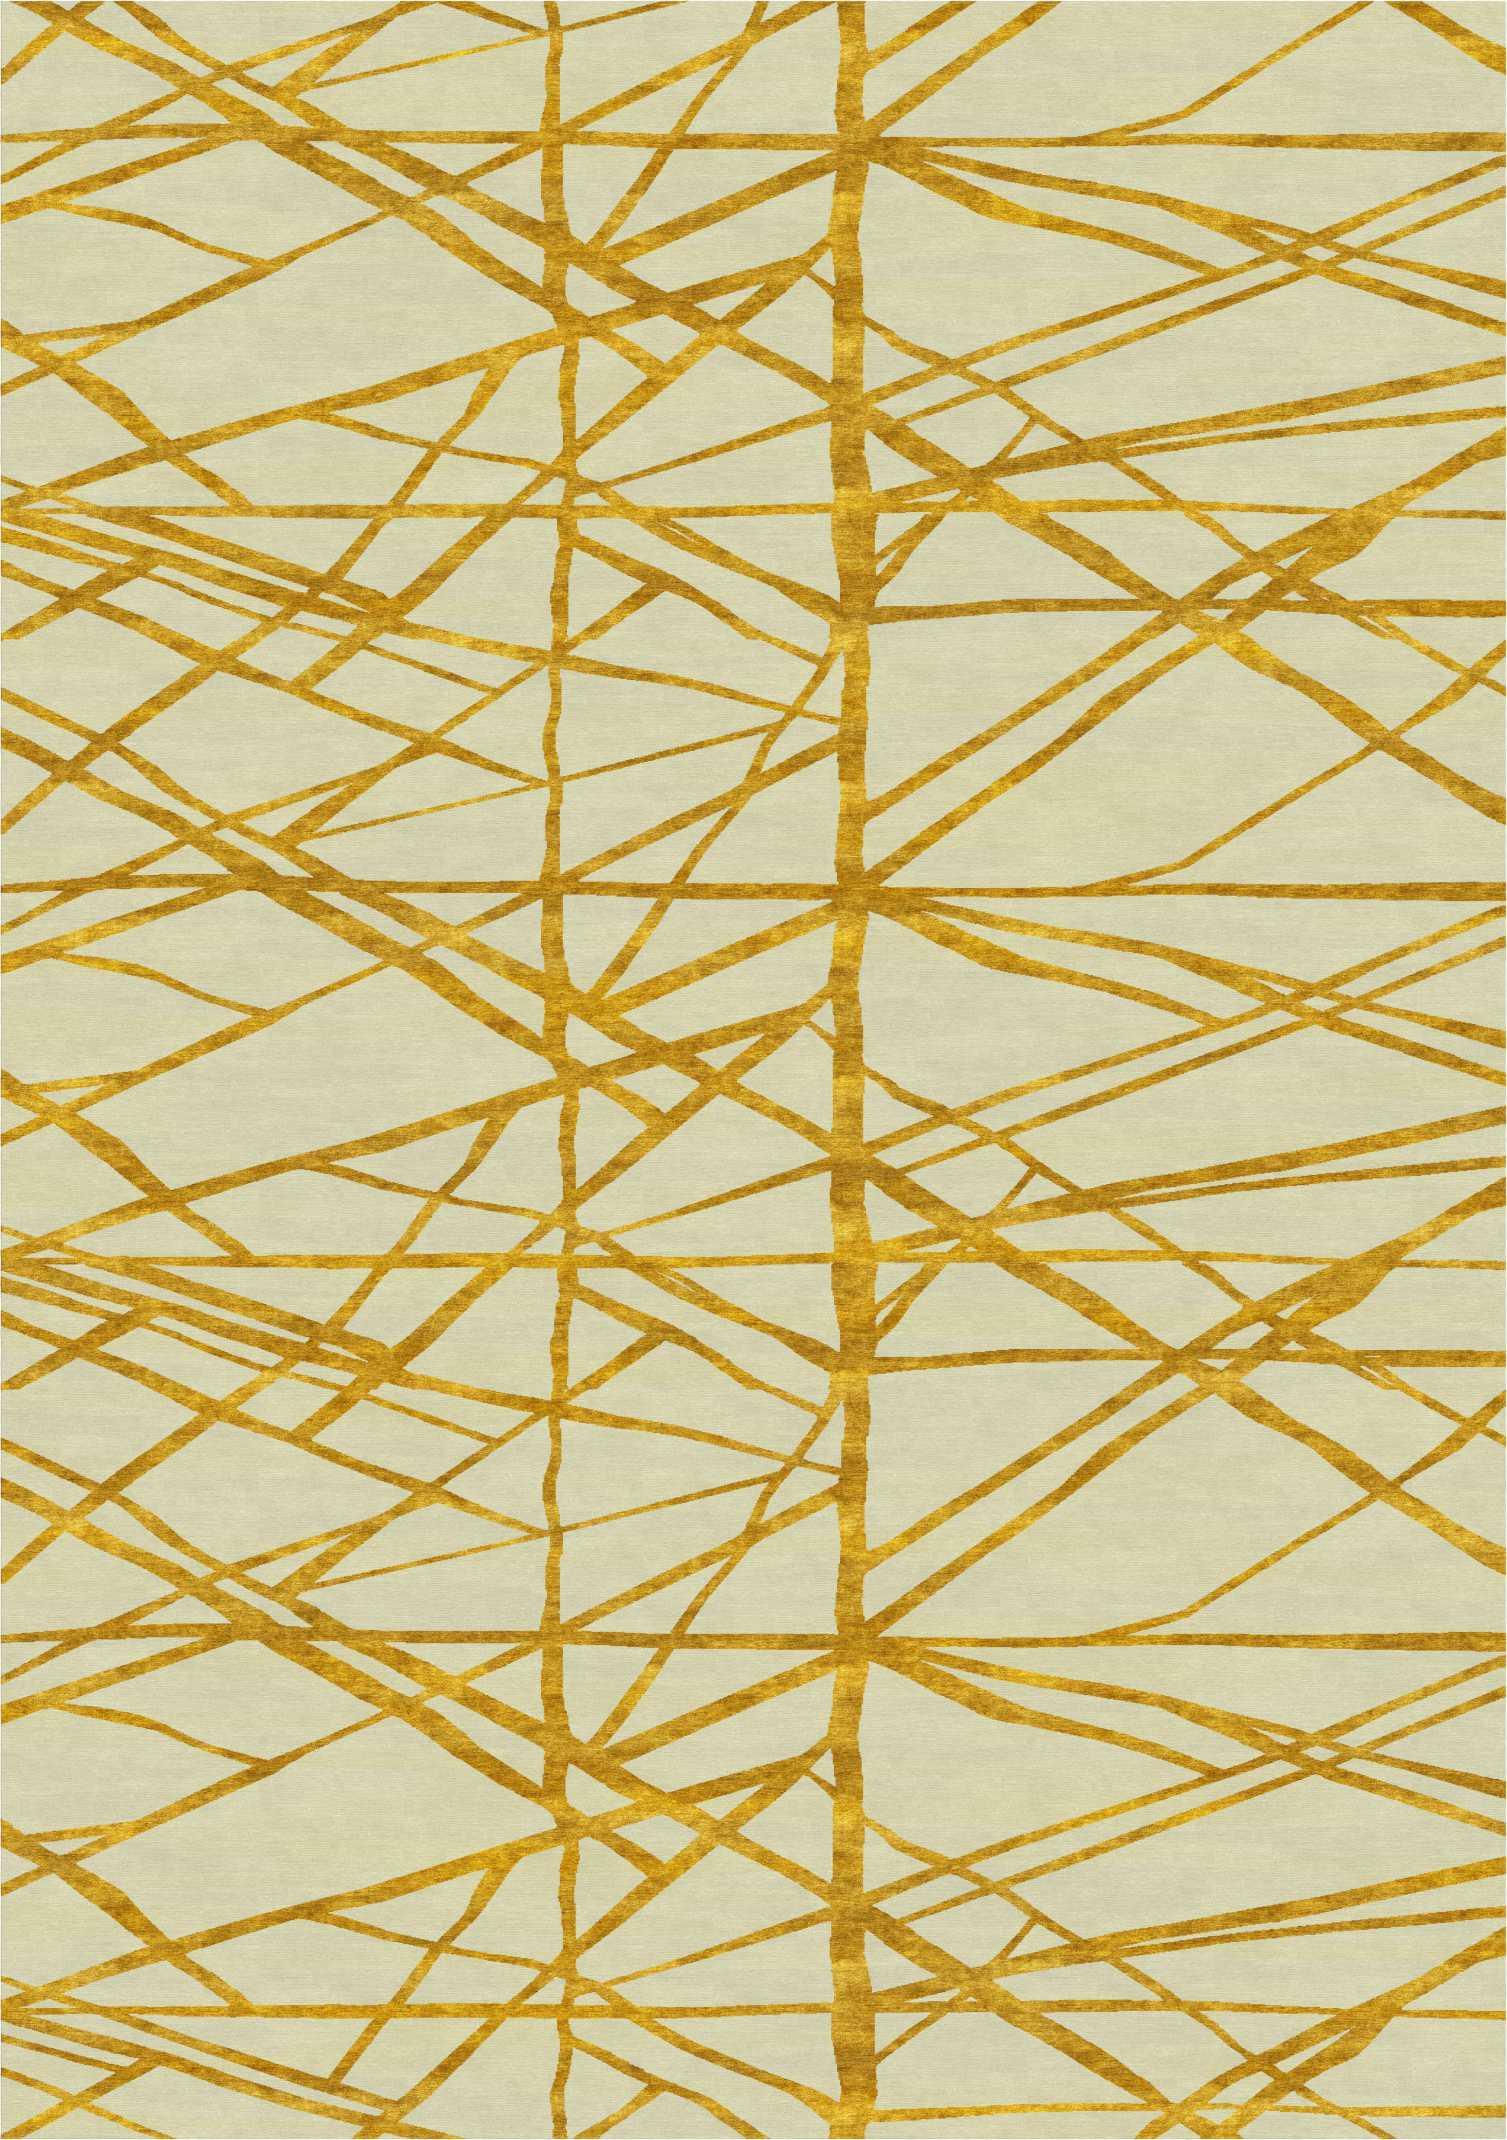 Michael Brabetz Custom Rugs & Carpet Designs   Brabetz Rugs